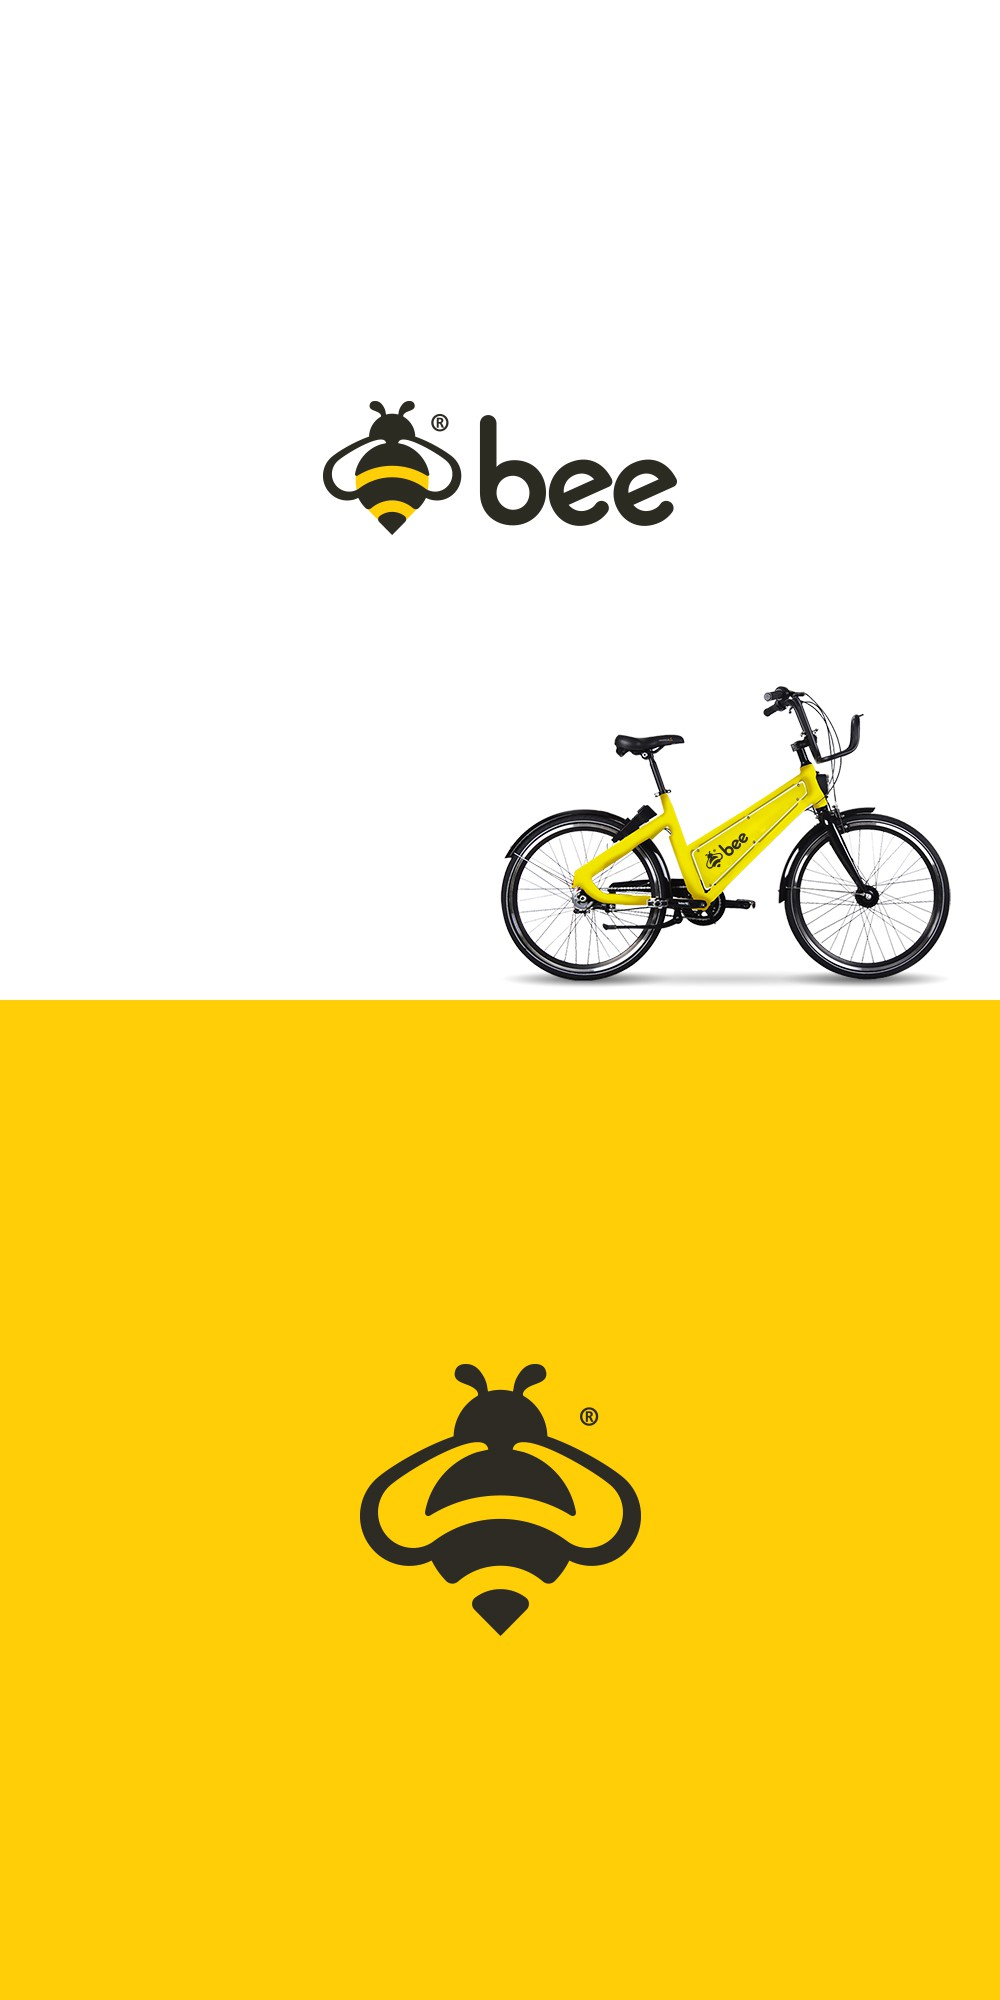 BEE logo design project